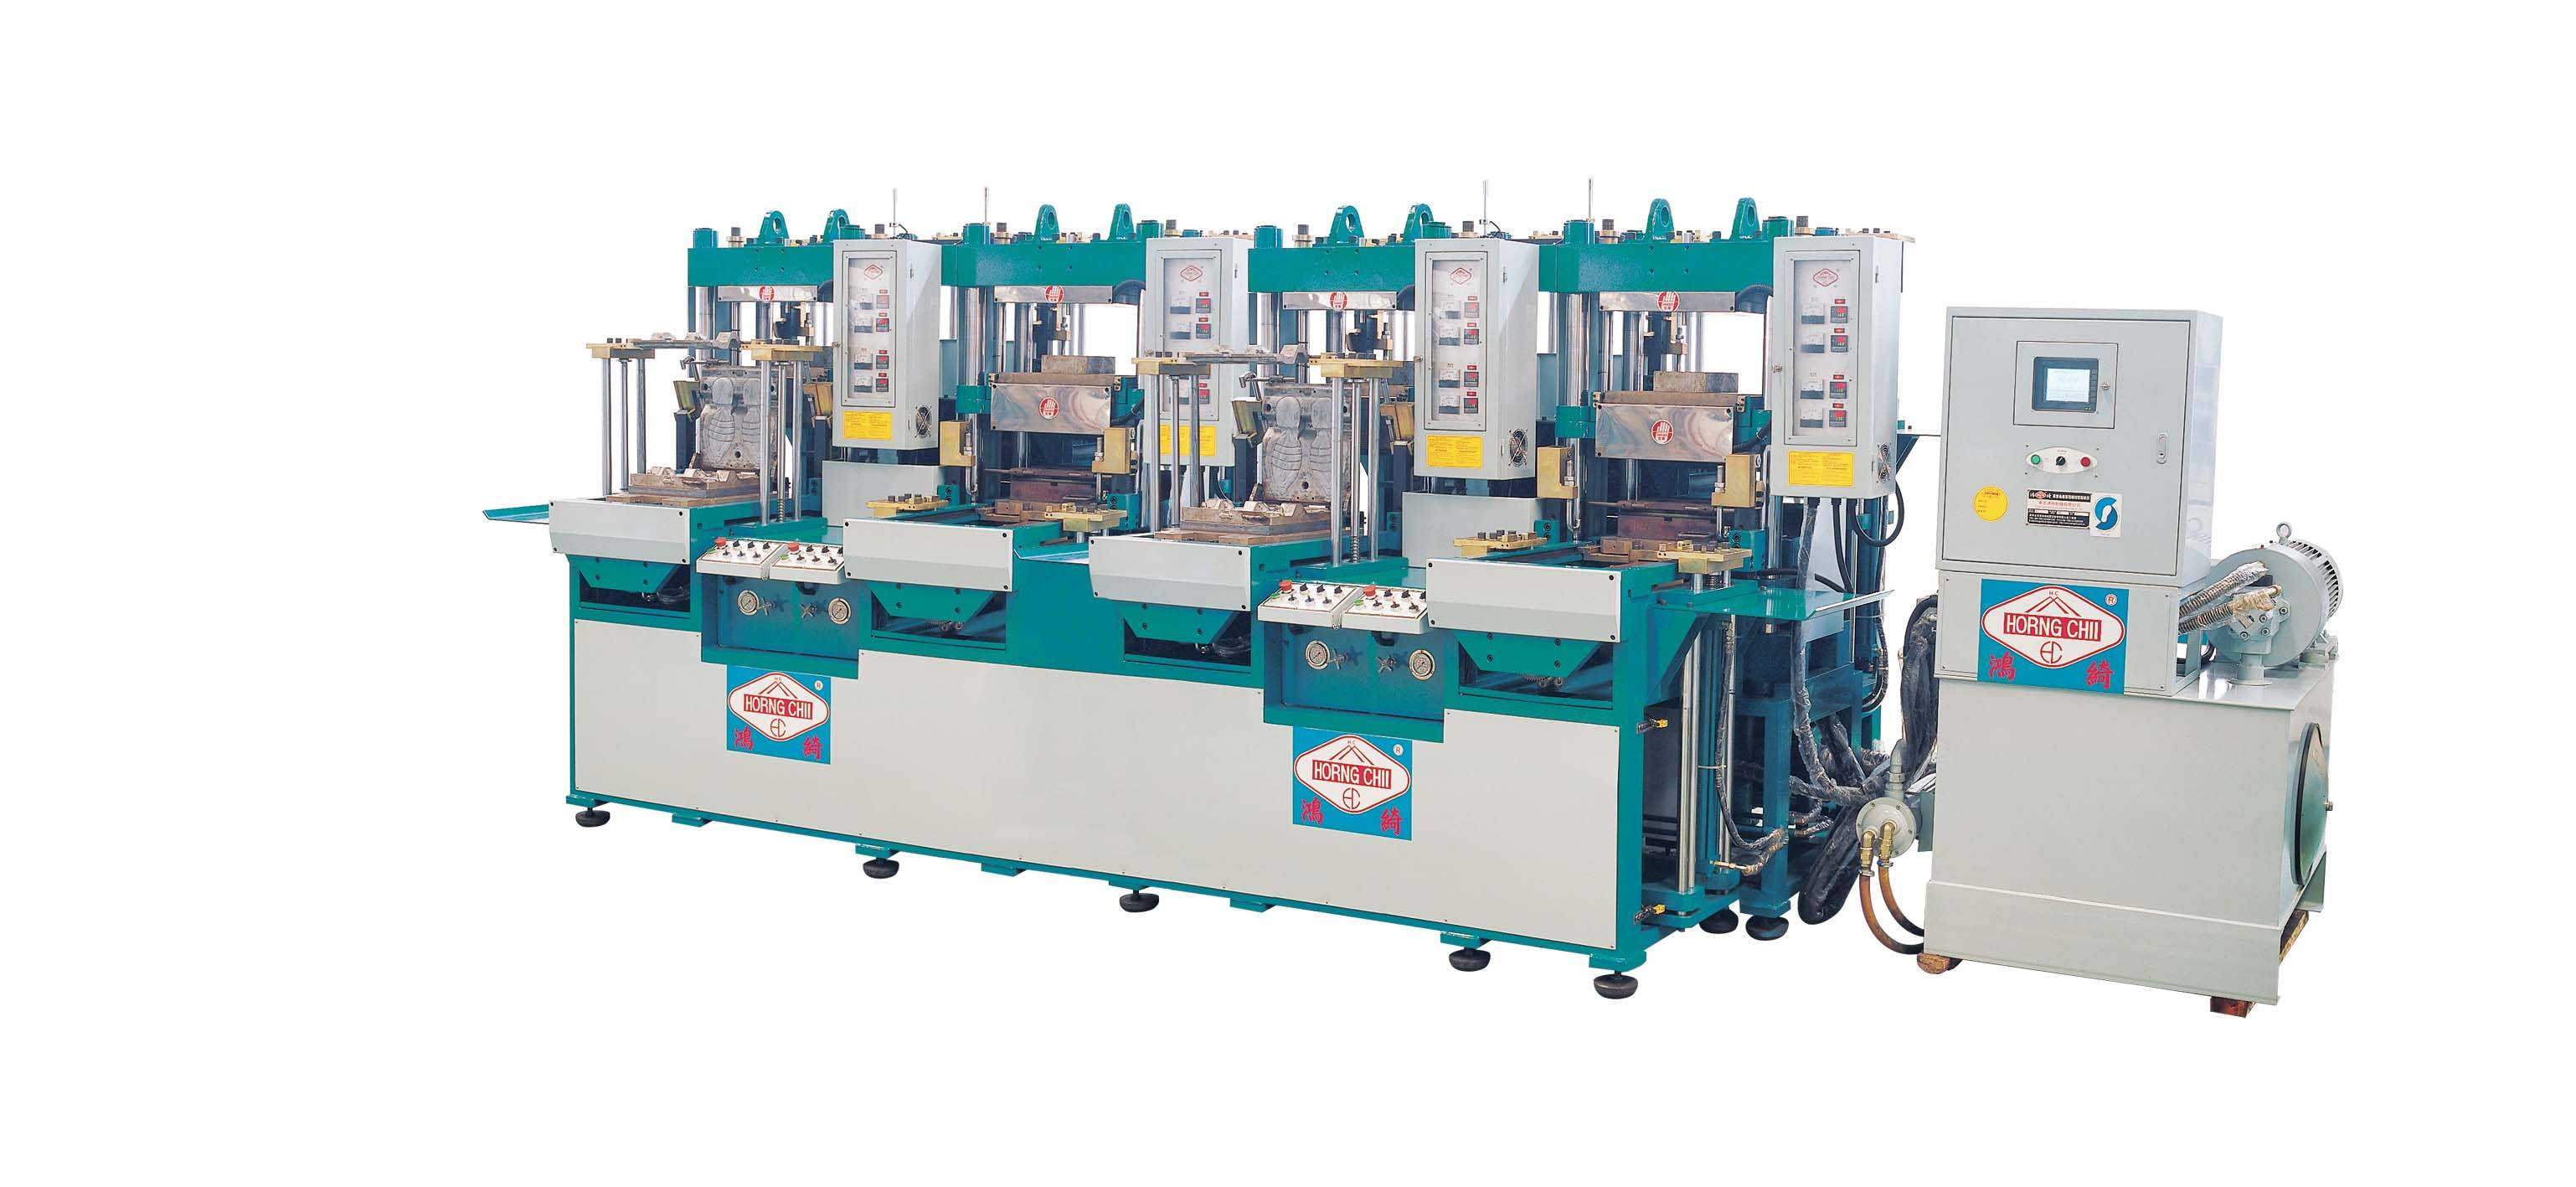 HC-328 Automatic Rubber Molding Machine